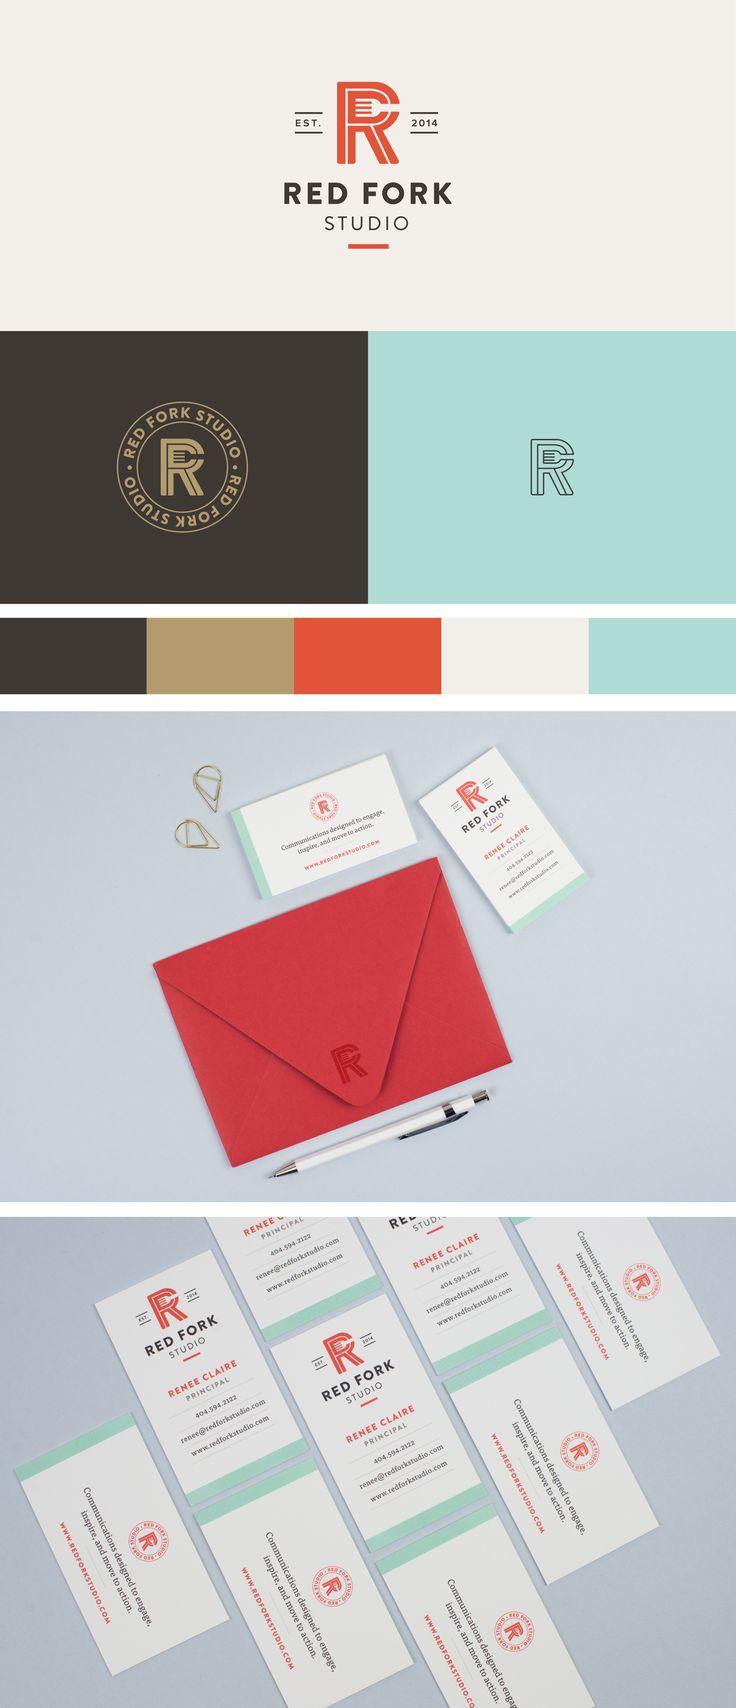 Red Fork Studio brand identity | Spruce Rd. | logo design, pattern design, online marketing, branding, monogram